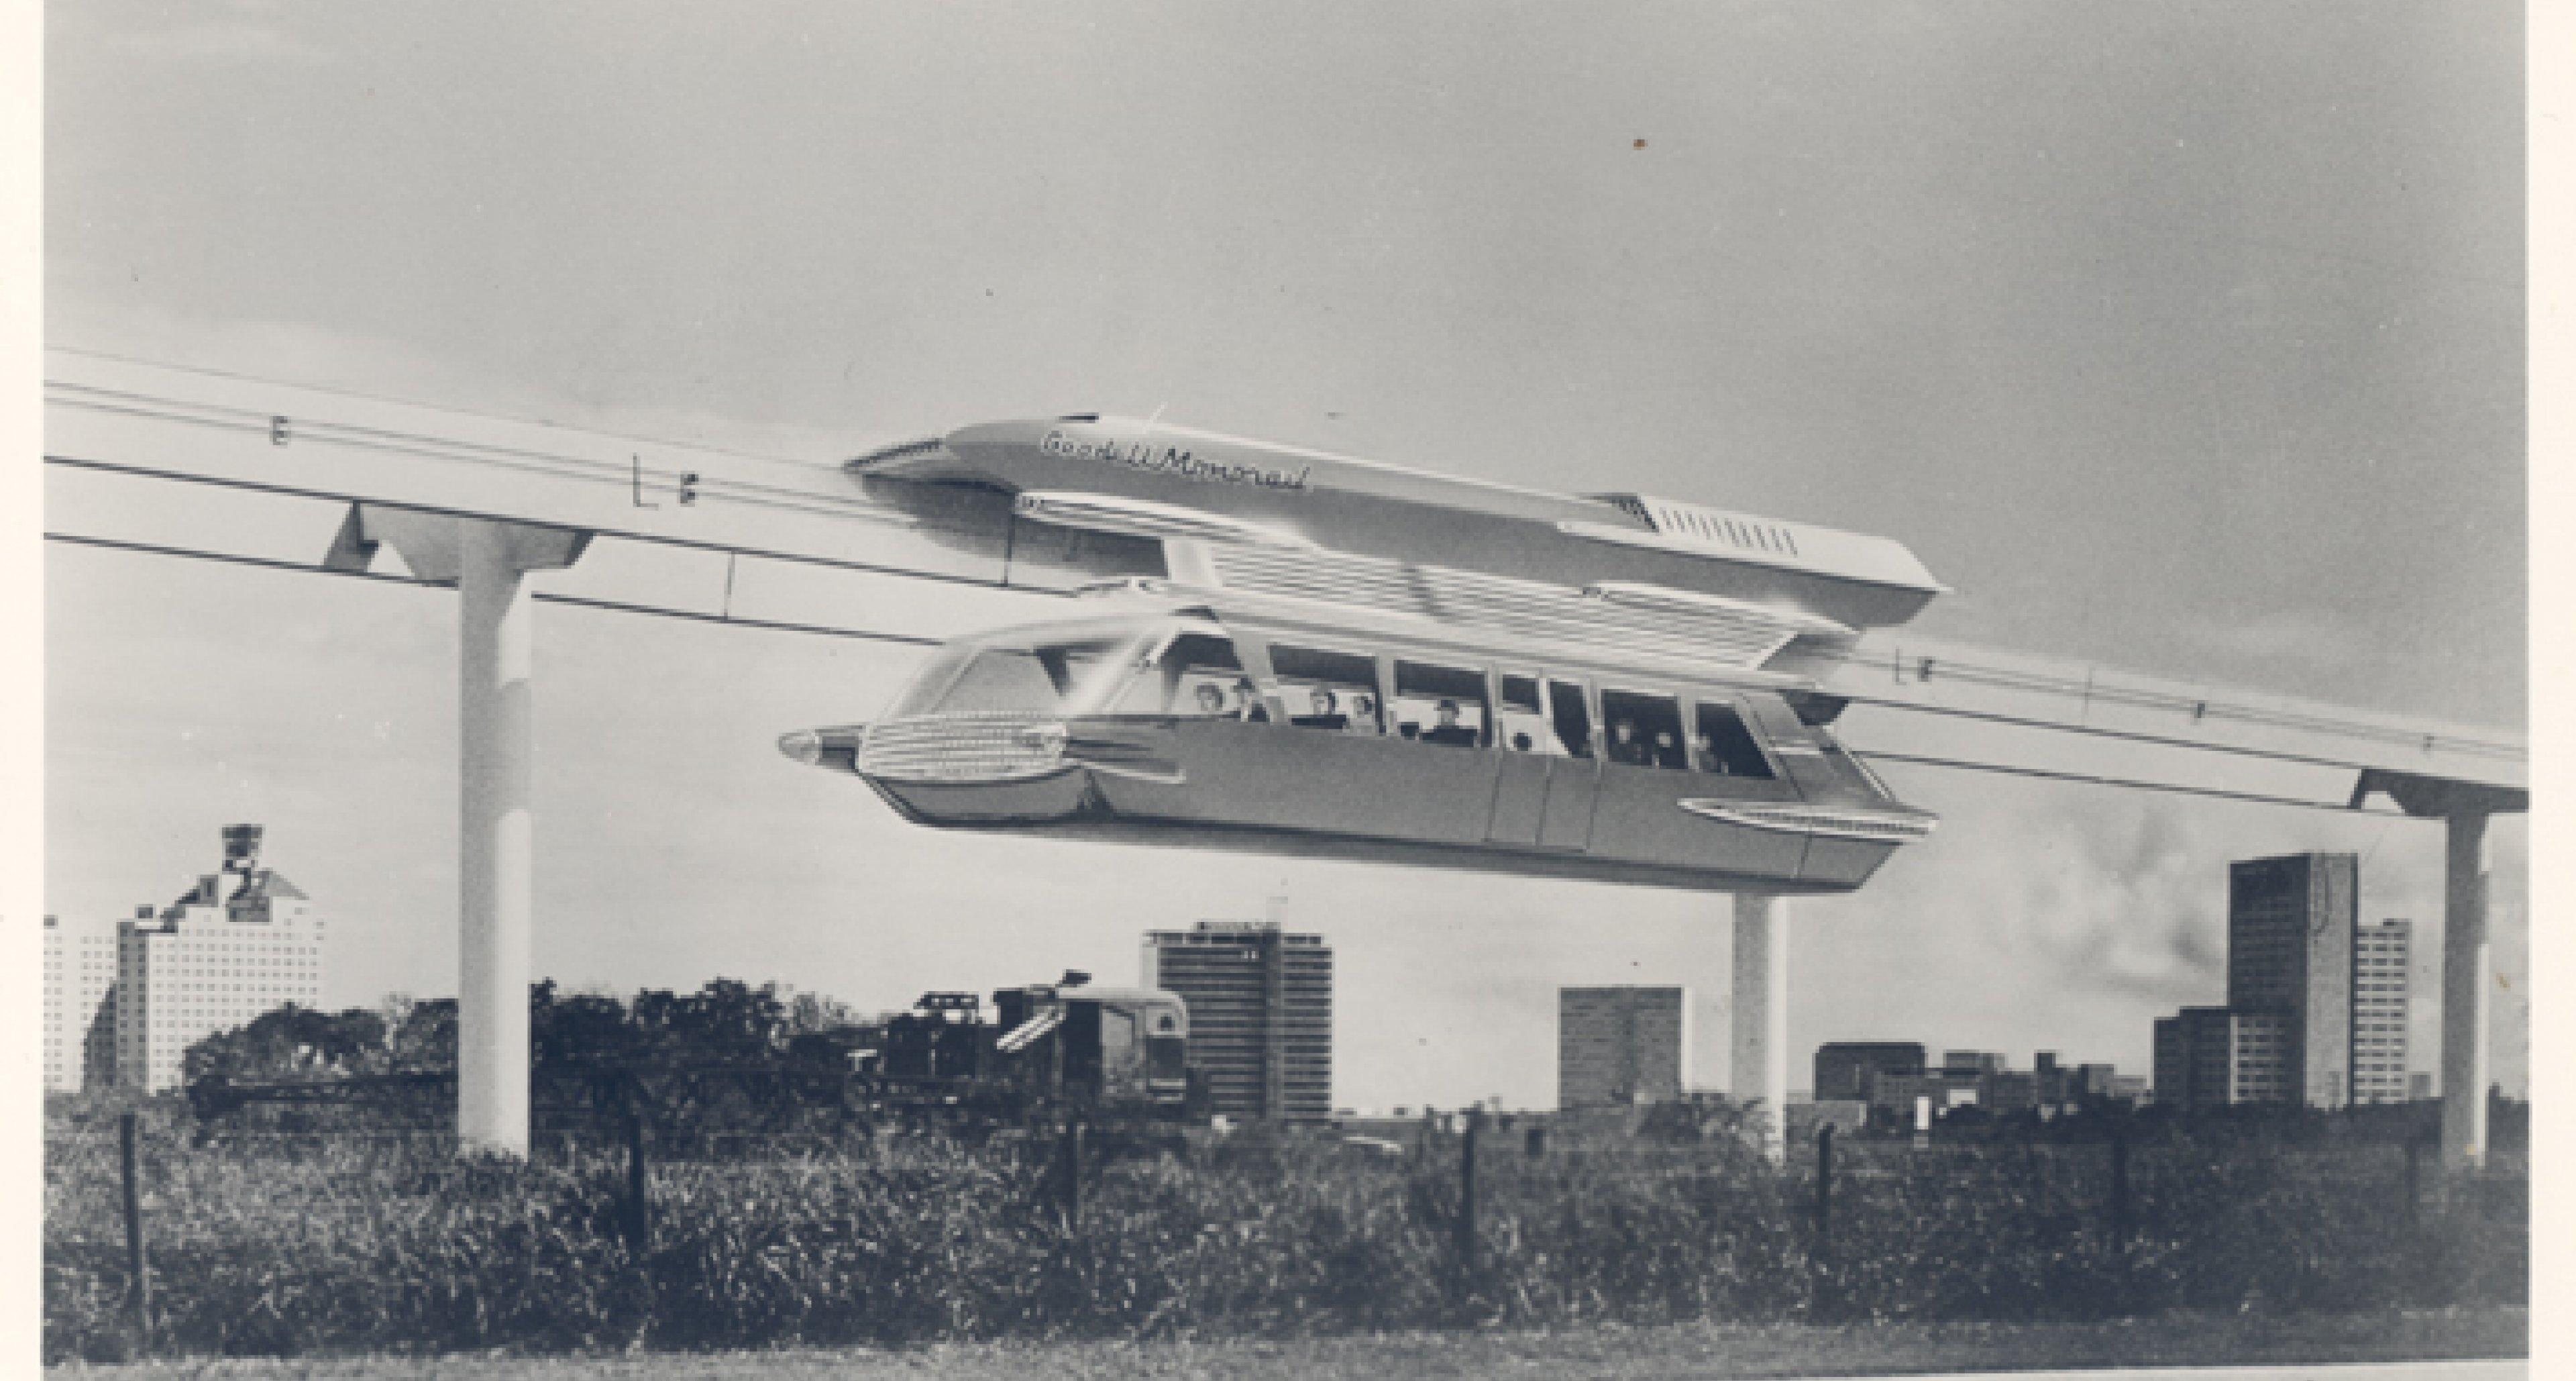 Goodell Monorail, 1963 (Los Angeles County Metropolitan)